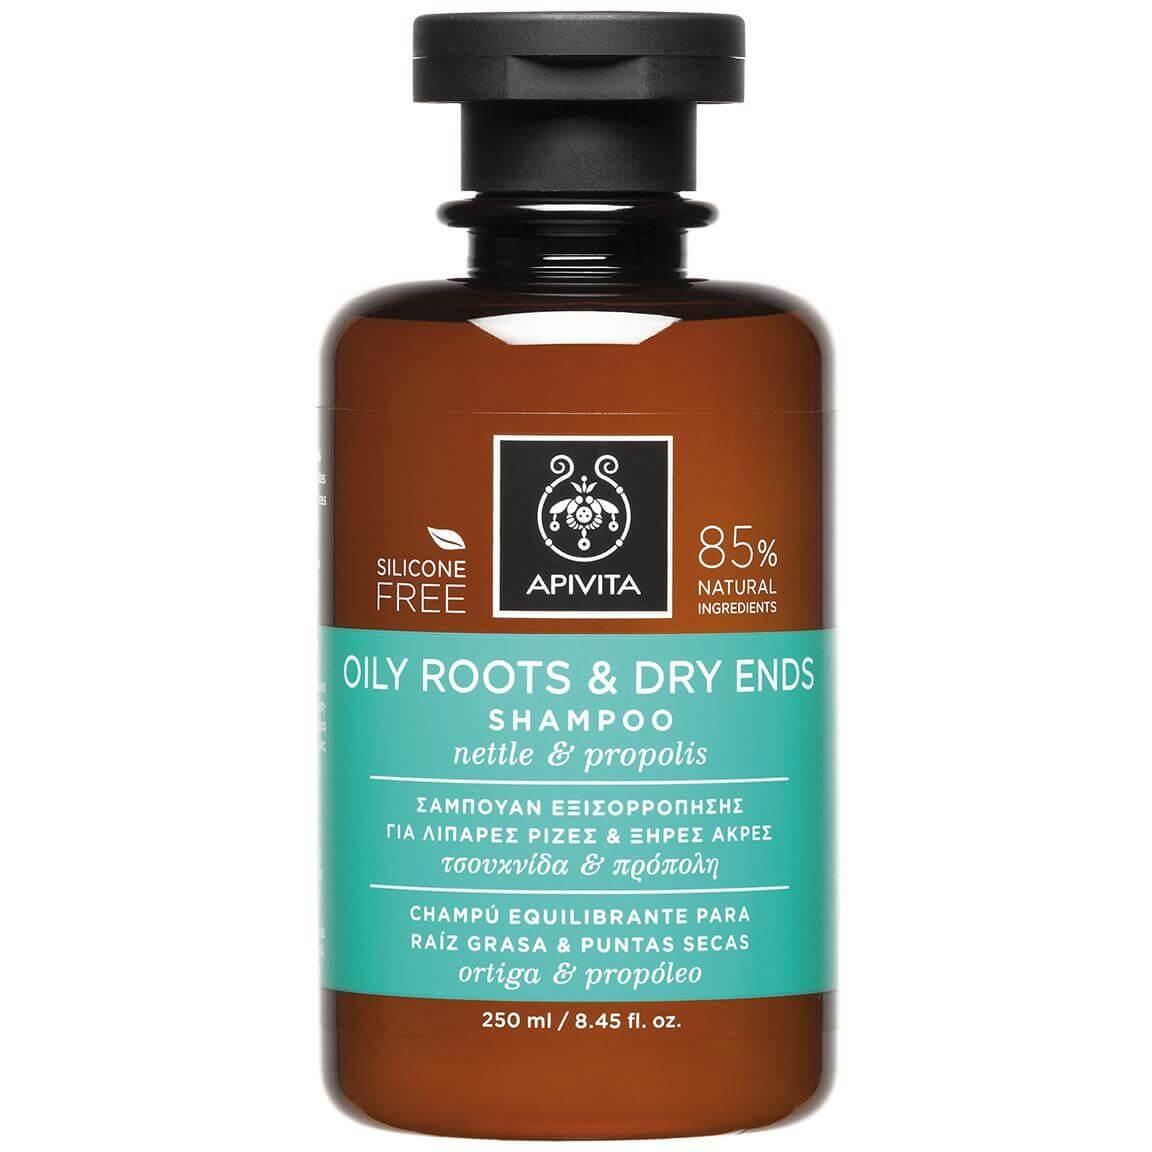 Apivita Oily Roots & Dry Ends Shampoo Σαμπουάν Εξισορρόπησης για Λιπαρές Ρίζες Ξηρές Άκρες με Τσουκνίδα & Πρόπολη 250ml